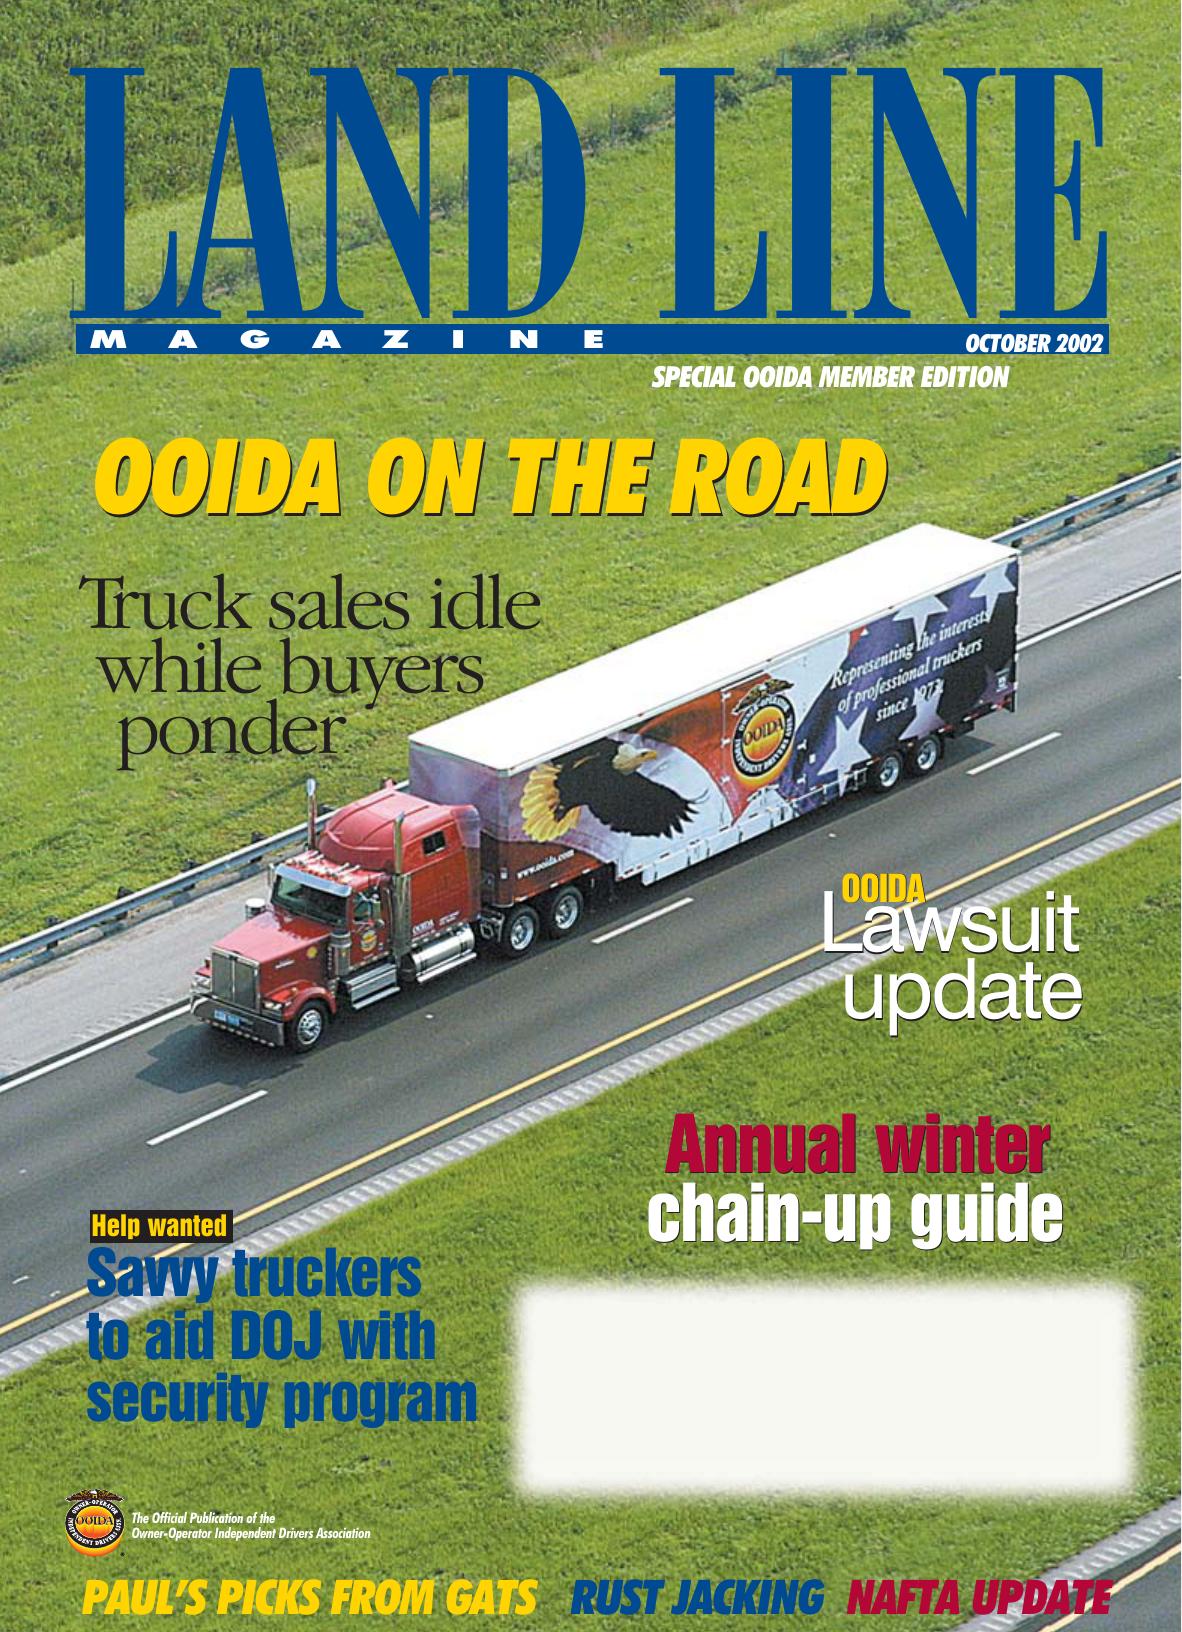 Land Line Magazine October 2002 | manualzz com